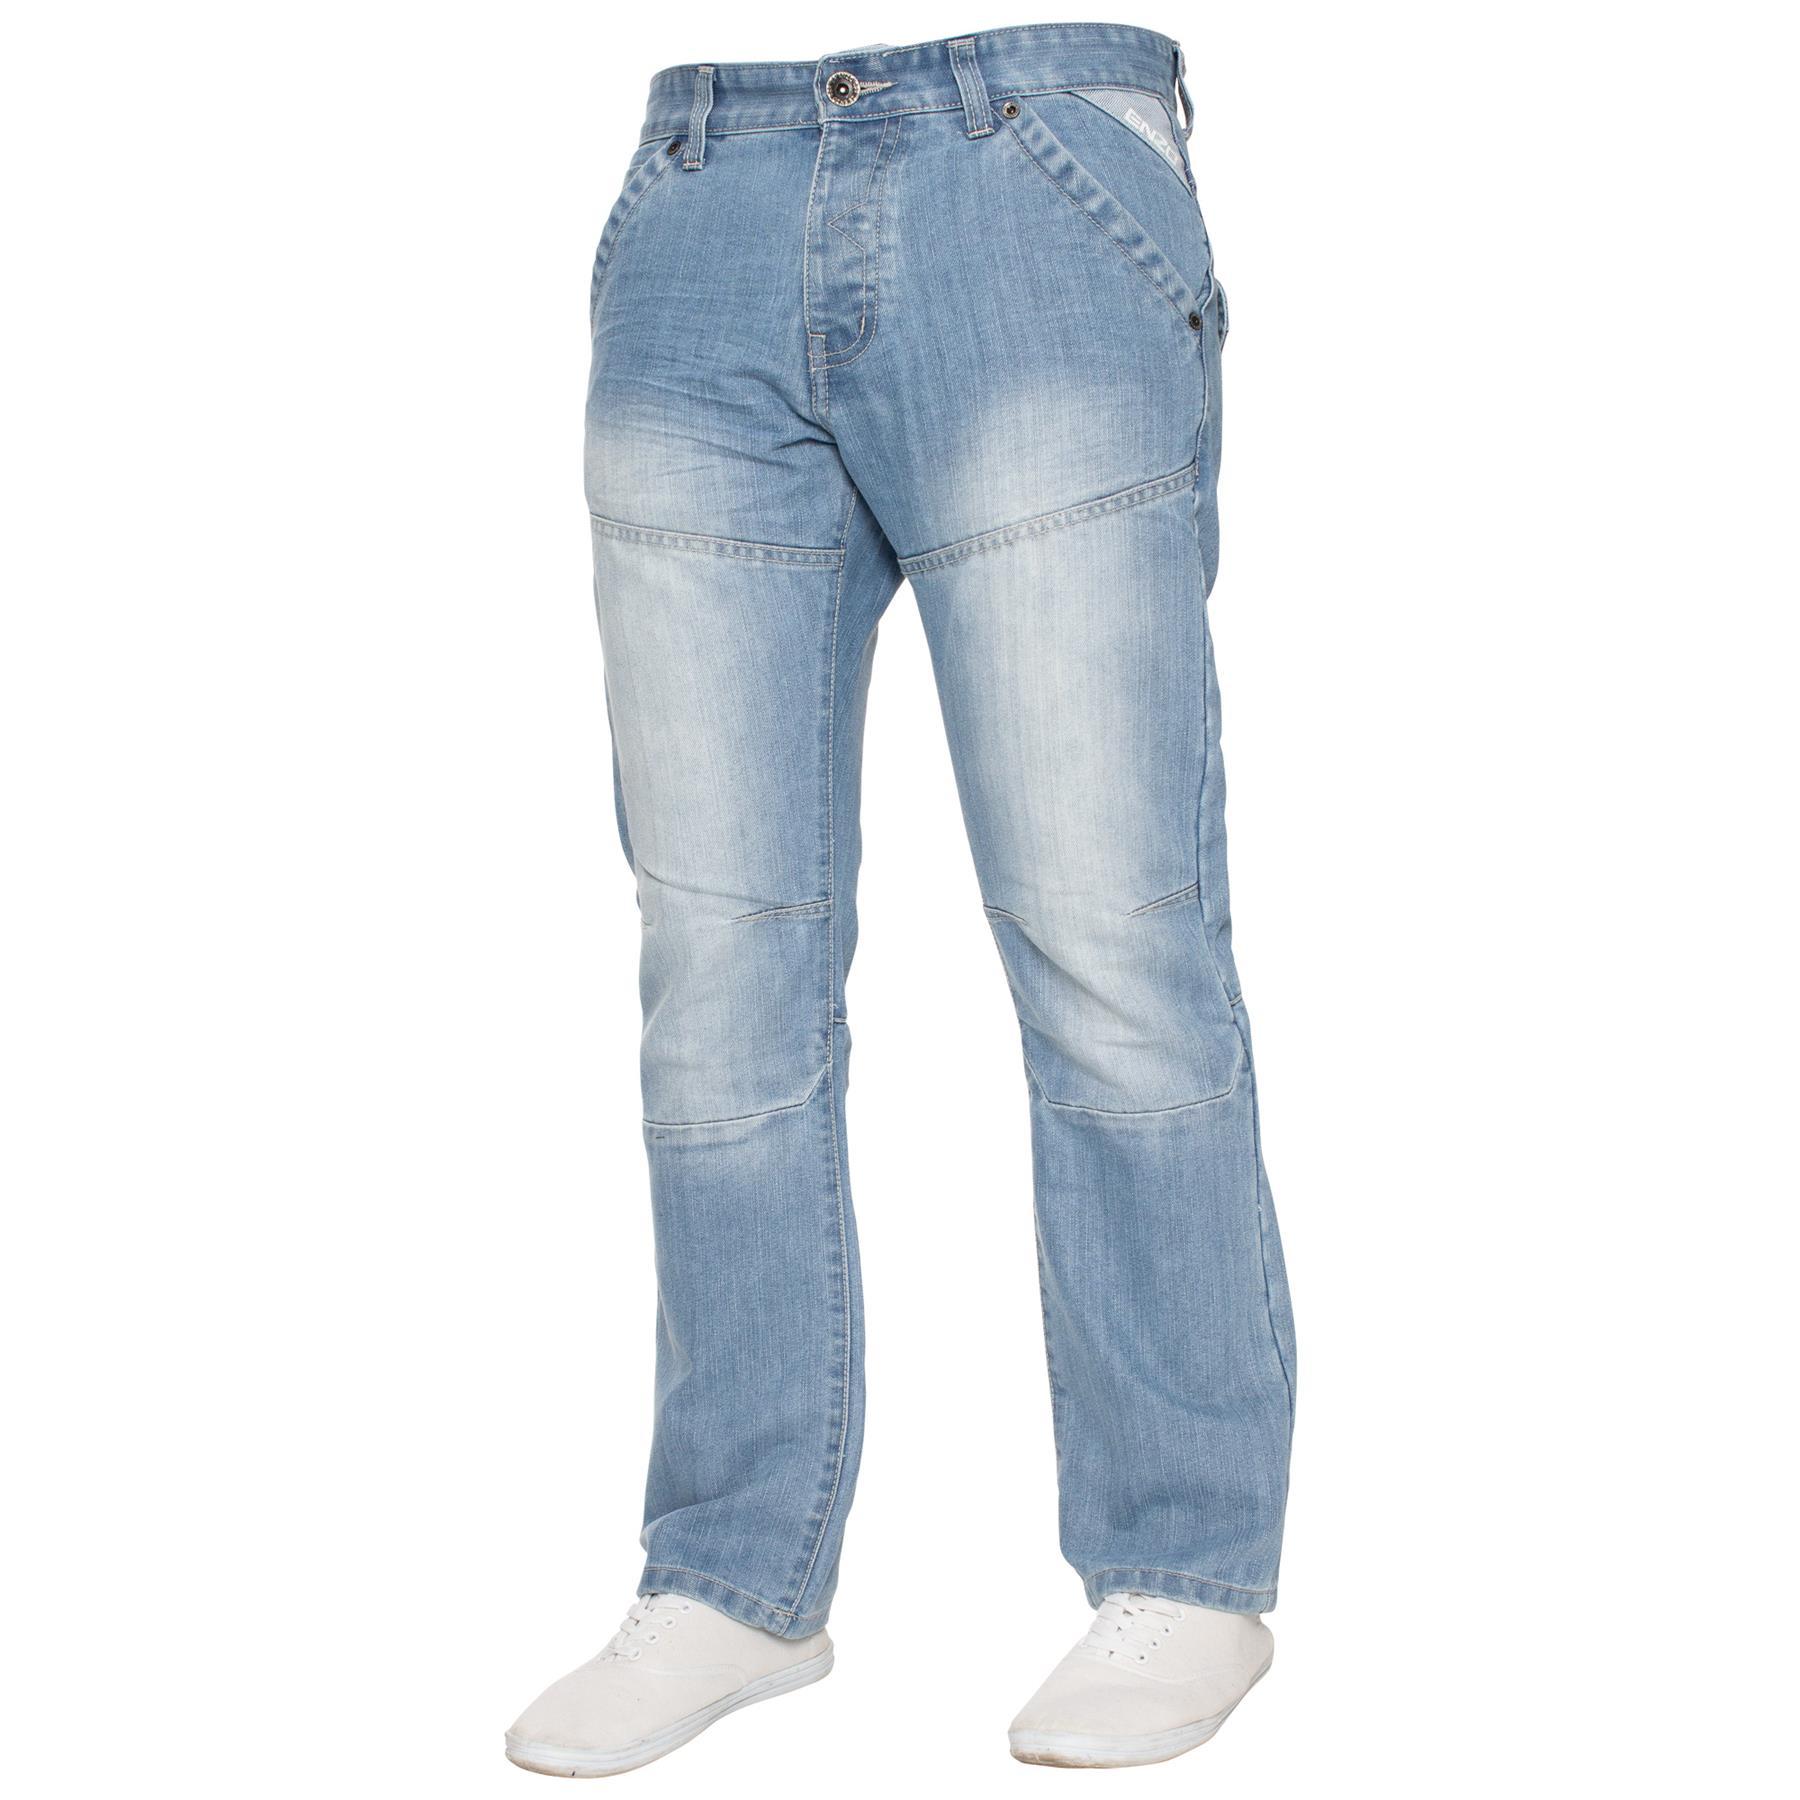 Enzo-Mens-Big-Tall-Jeans-Leg-King-Size-Denim-Pants-Chino-Trousers-Pants-44-034-60-034 thumbnail 66